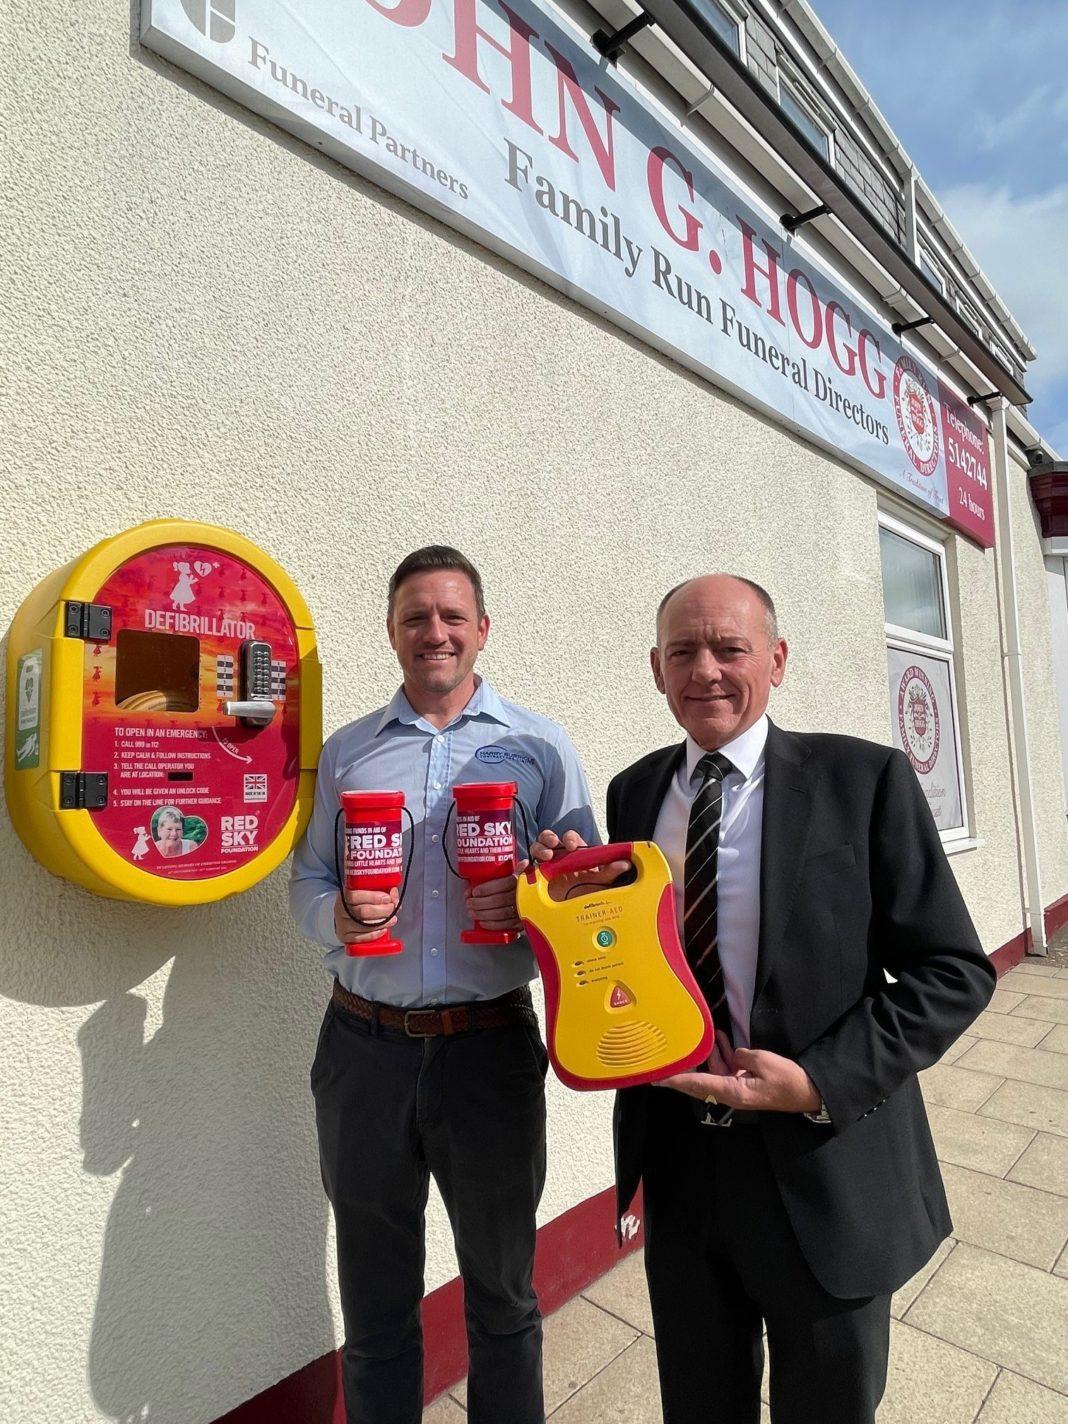 New Defribillator Installed In Sunderland In Memory Of Christine Graham